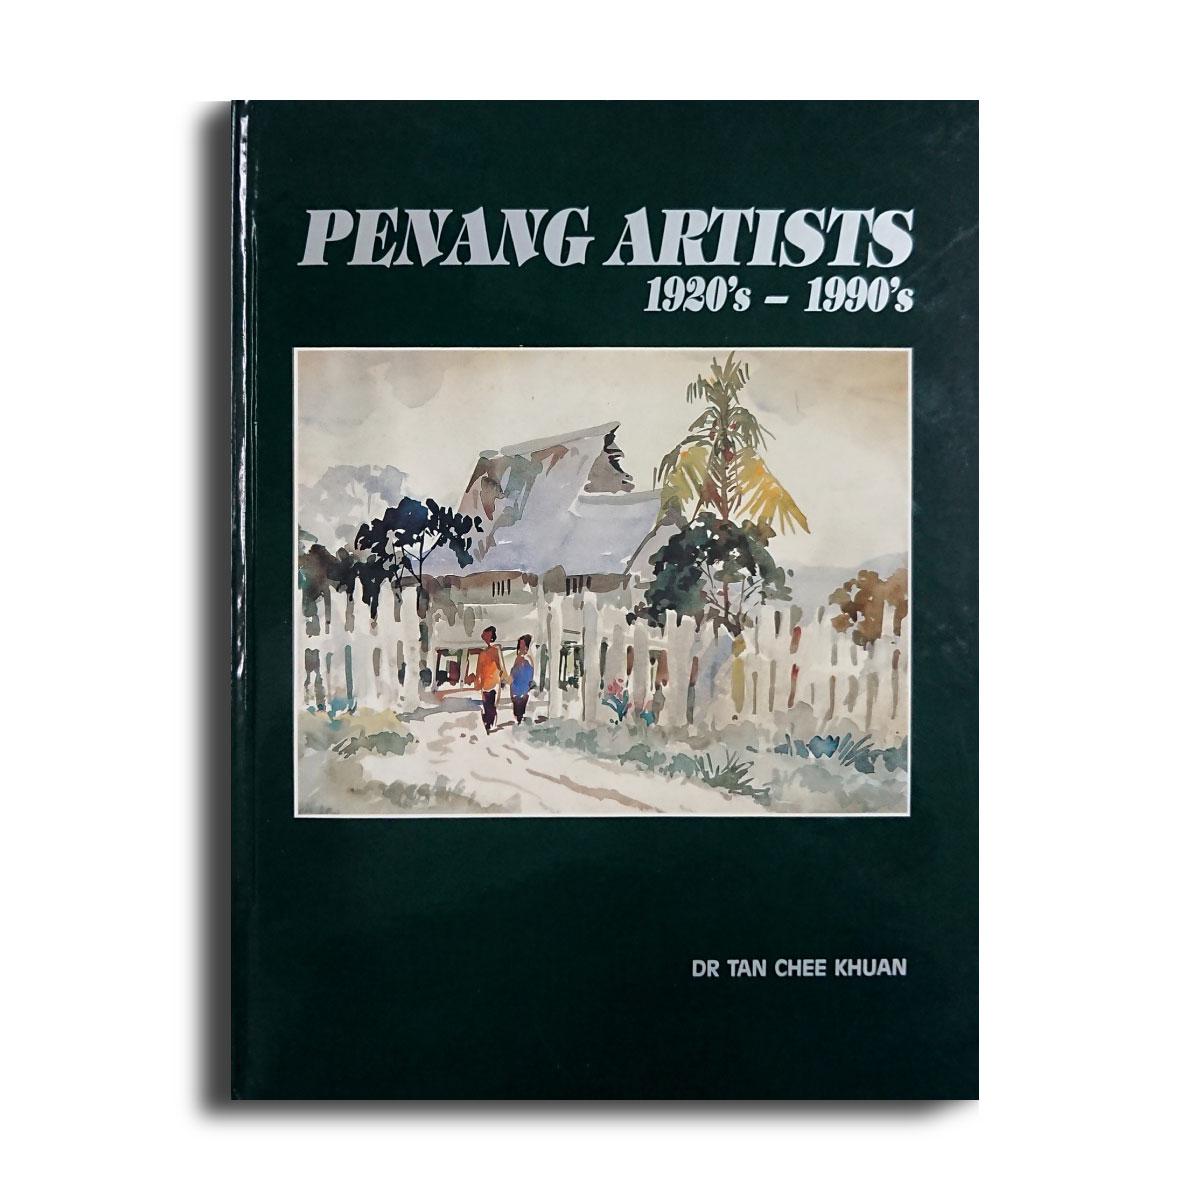 Penang Artists 1920's - 1990's